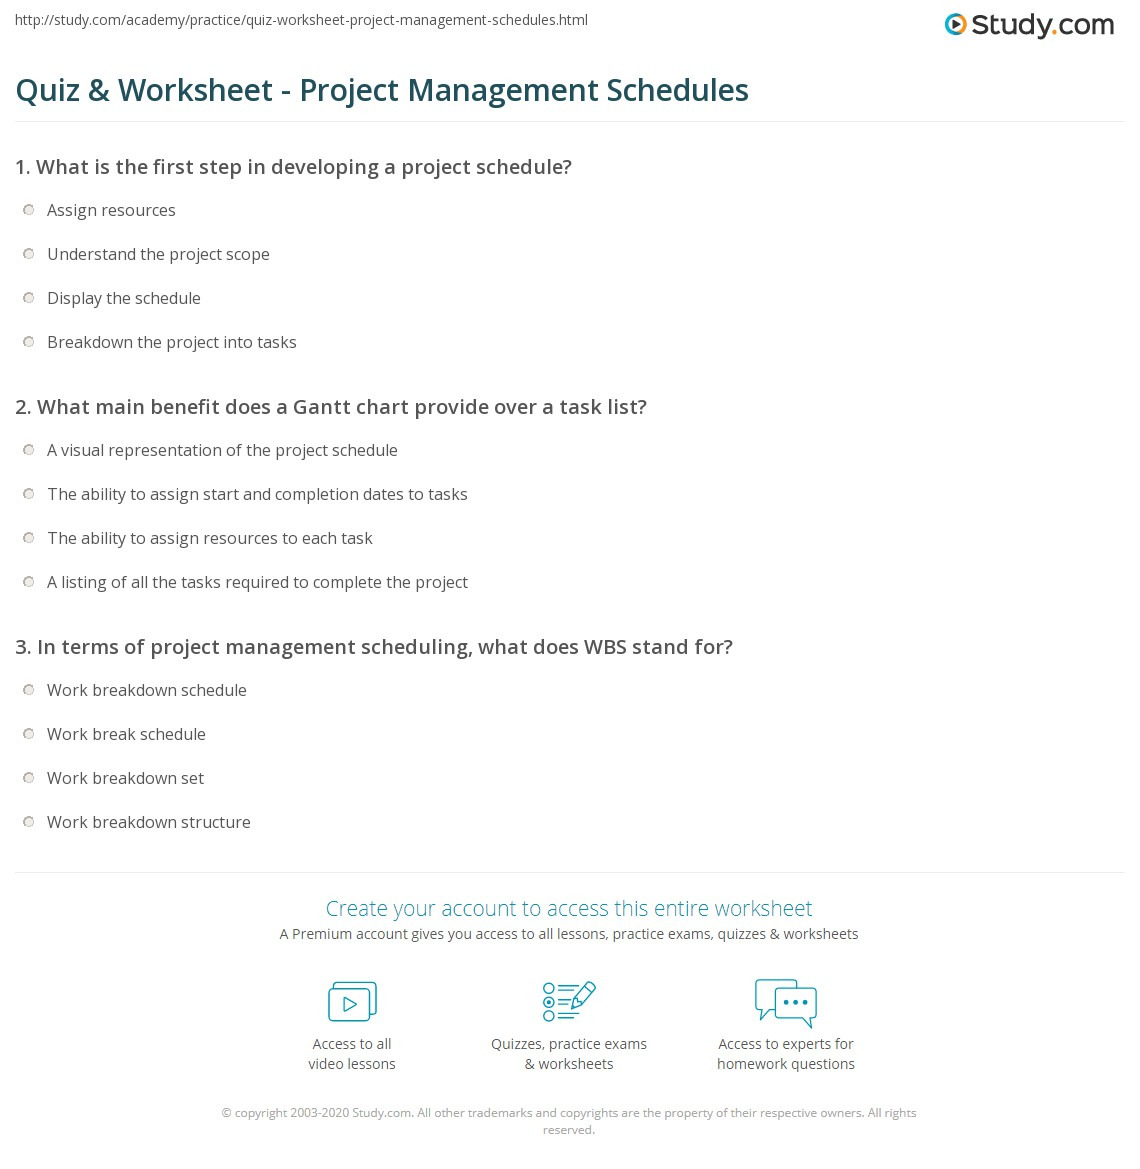 Worksheets Scheduling Worksheet quiz worksheet project management schedules study com print scheduling tools techniques worksheet